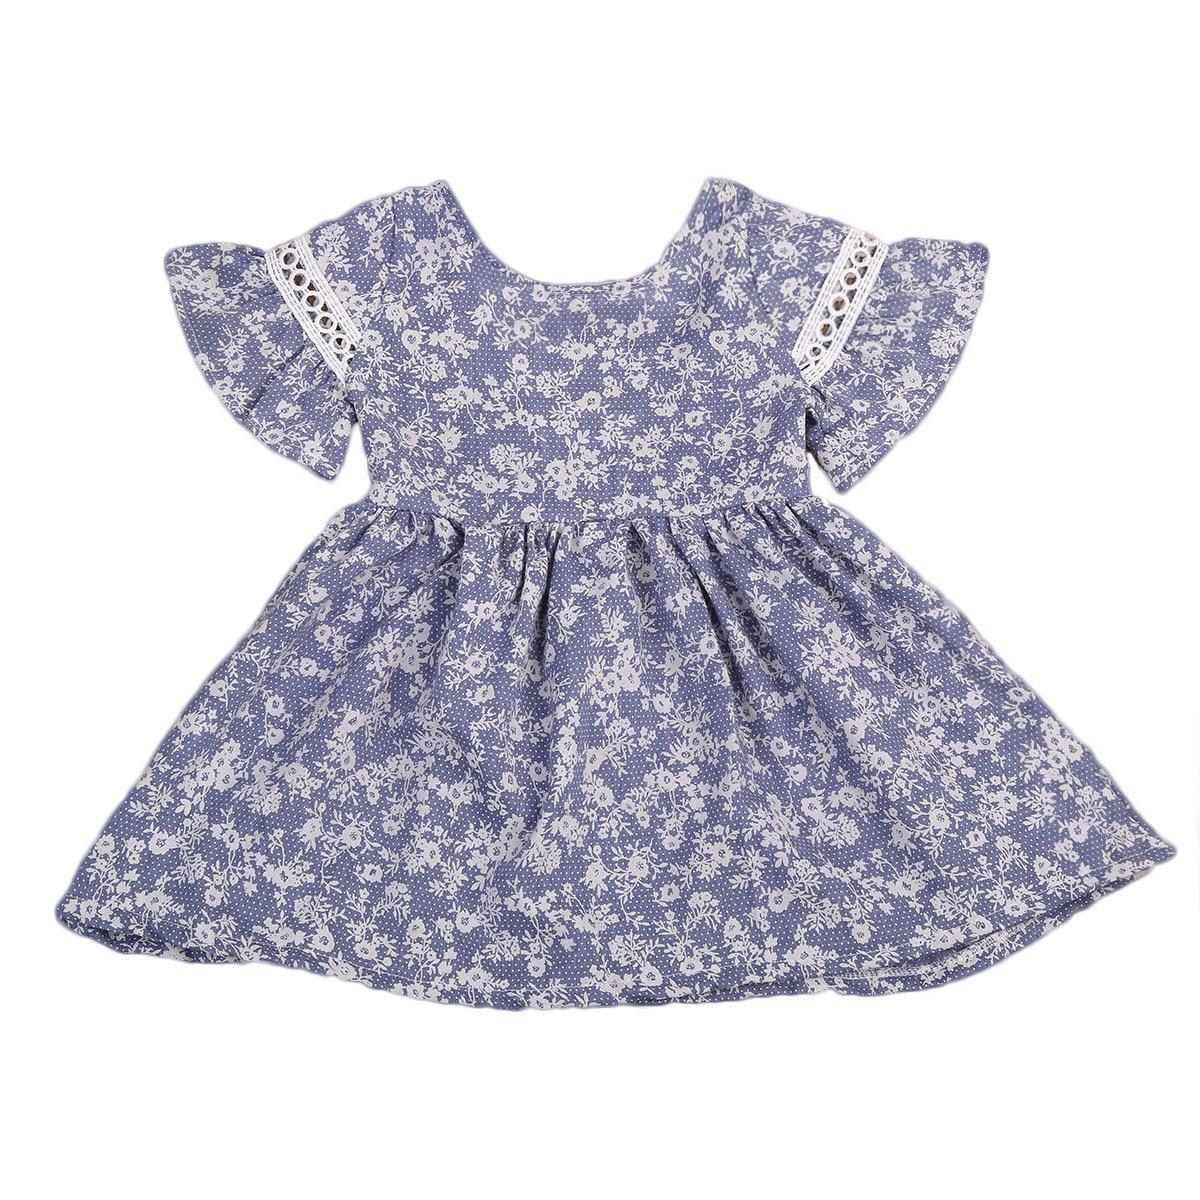 Helen115 Lovely Kids Baby Girls Summer Blue Floral Printed Short Sleeve O neck Dresses 2-7Years комплект аксессуаров для волос lovely floral